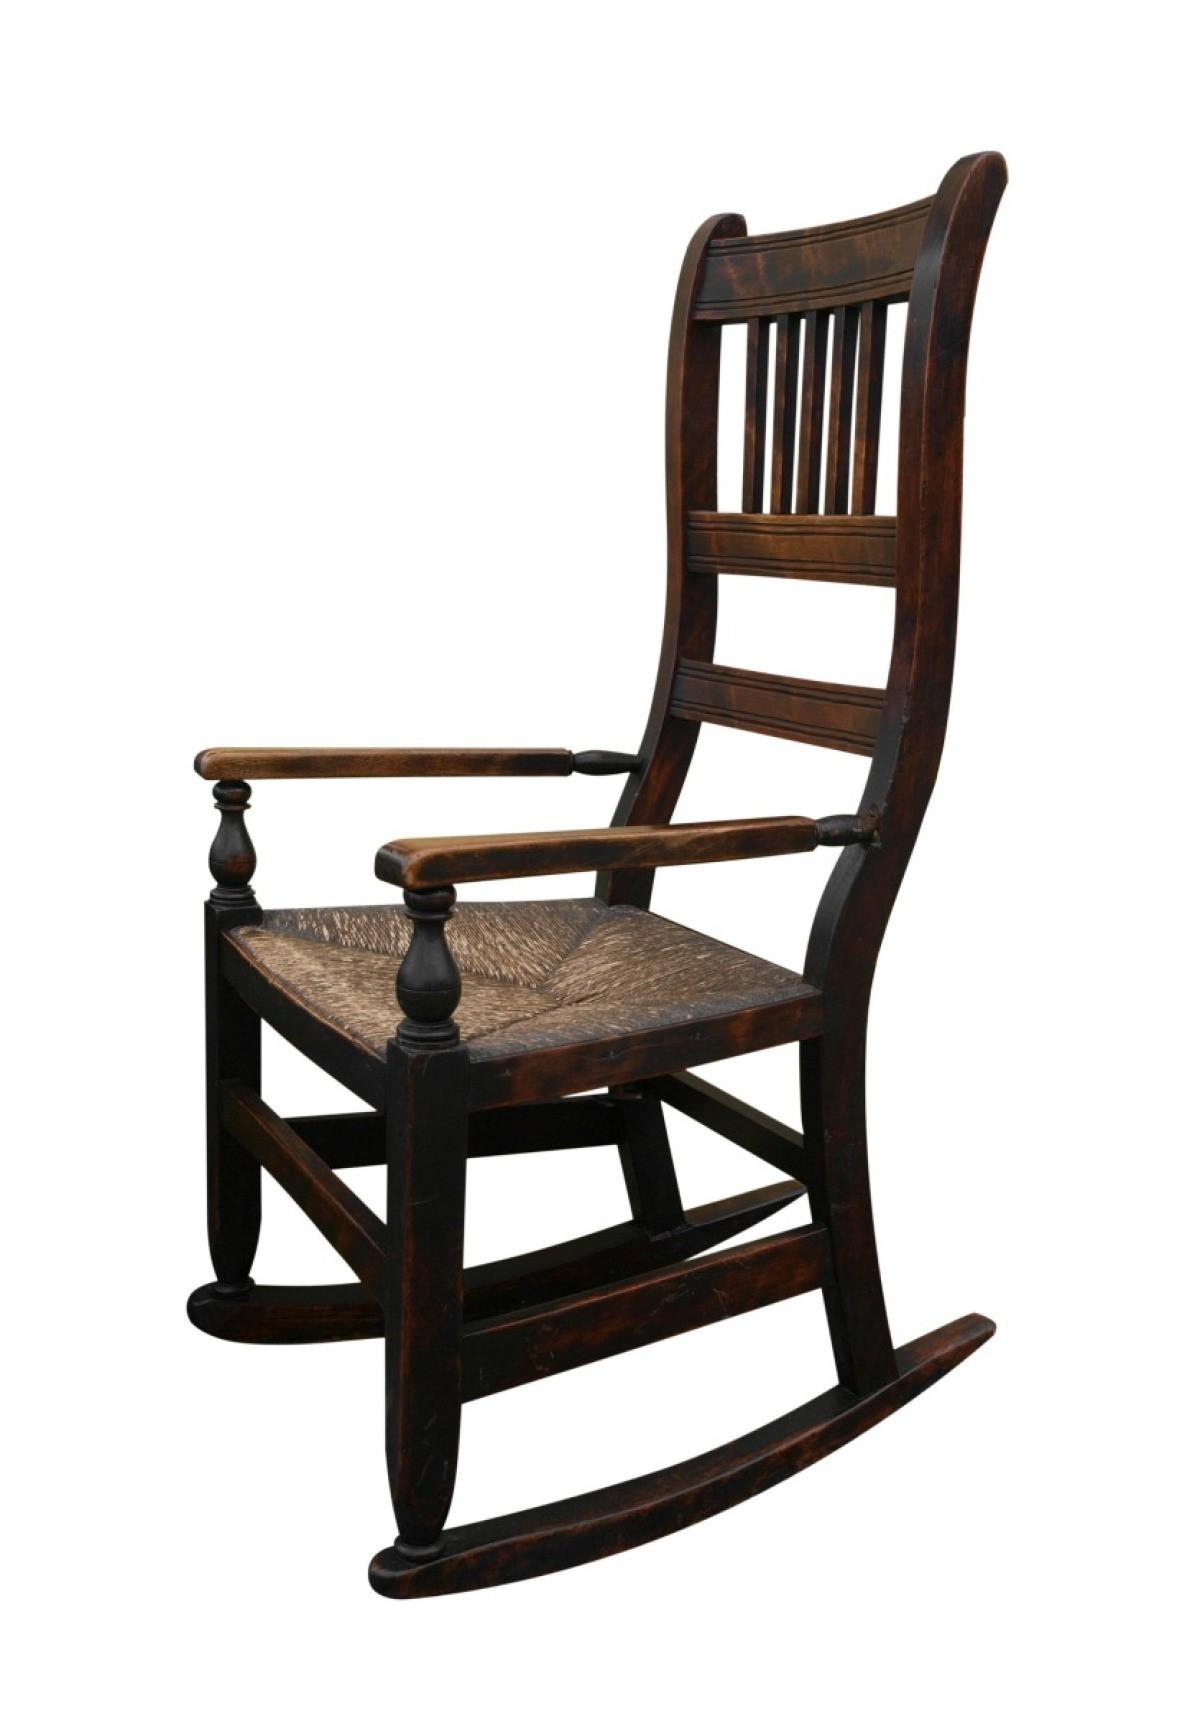 Stupendous Repairing A Rocking Chair Thriftyfun Beatyapartments Chair Design Images Beatyapartmentscom